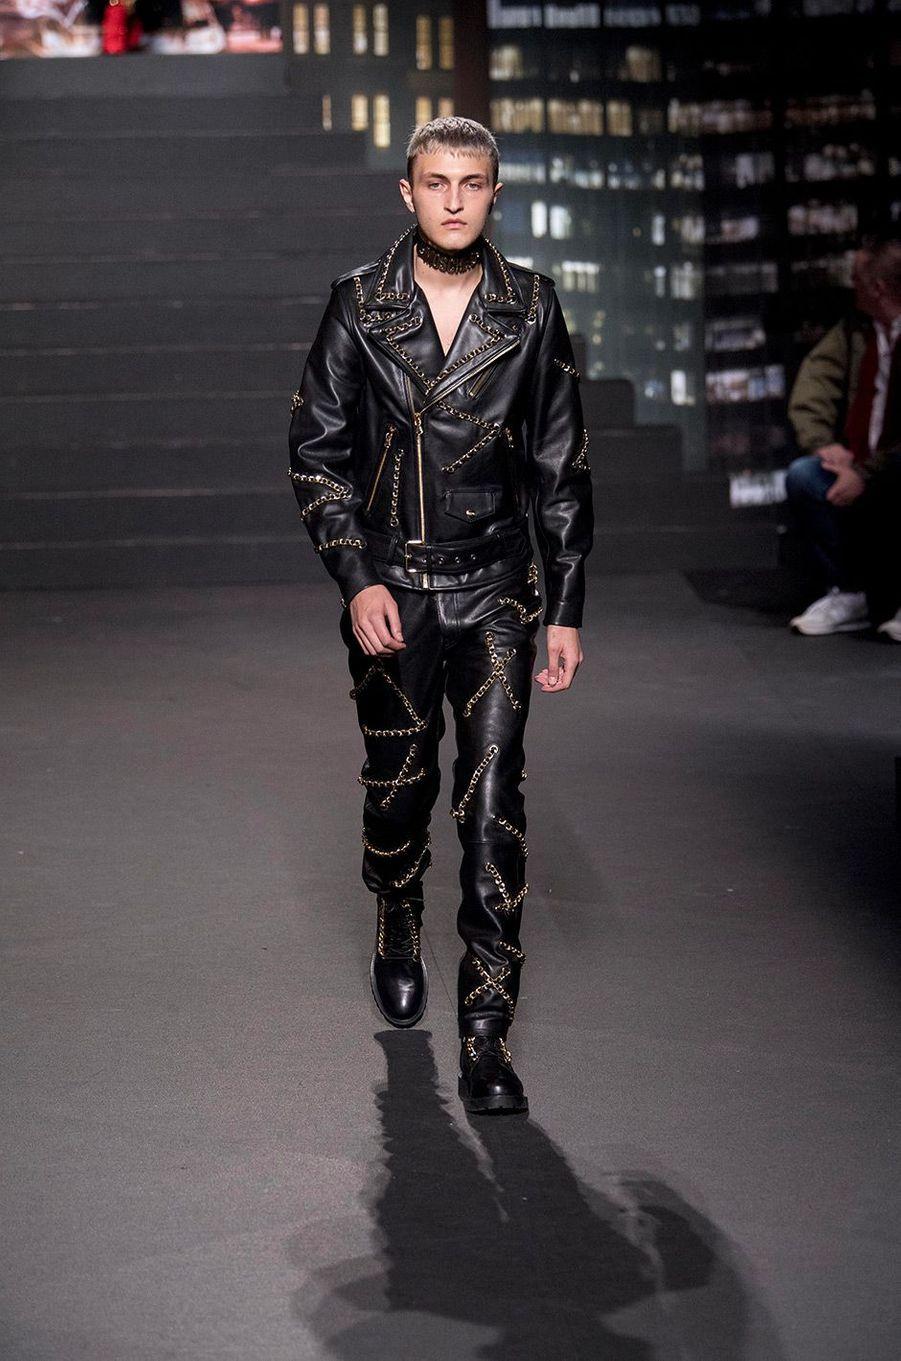 Anwar Hadid au défilé Moschino [tv] H&M, à New York, mercredi 24 octobre